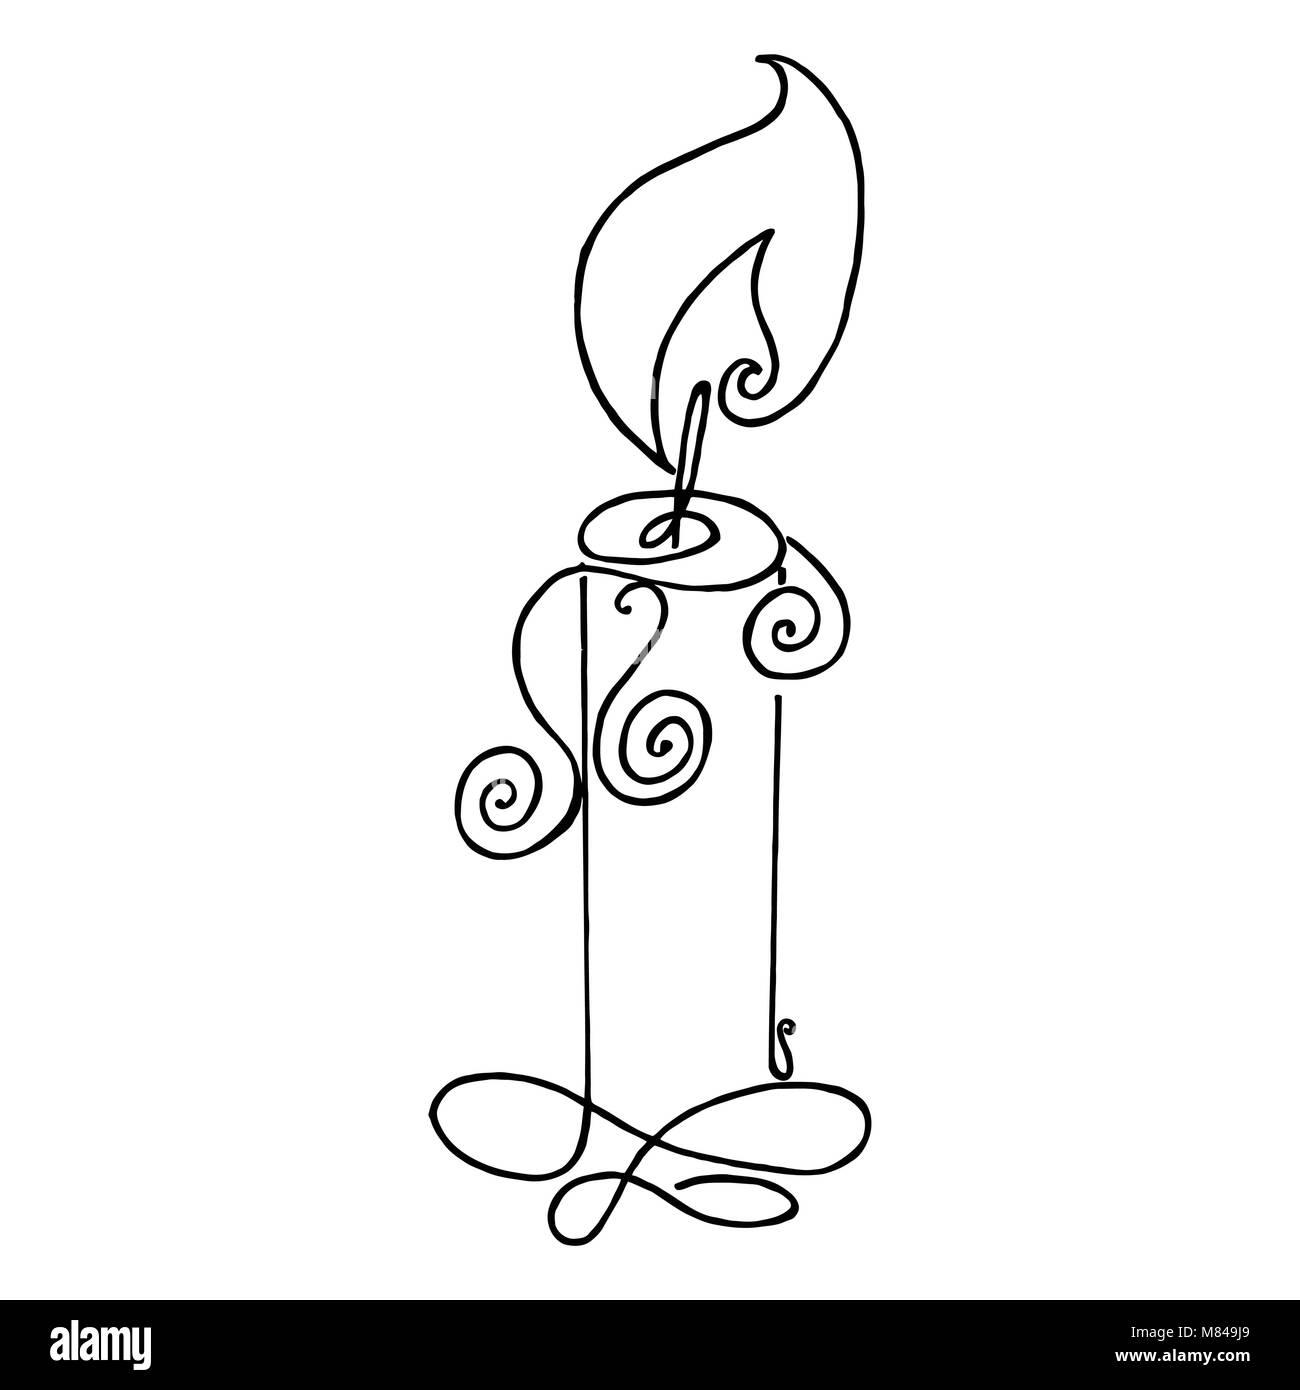 Candlestick Vector Vectors Imágenes De Stock & Candlestick Vector ...